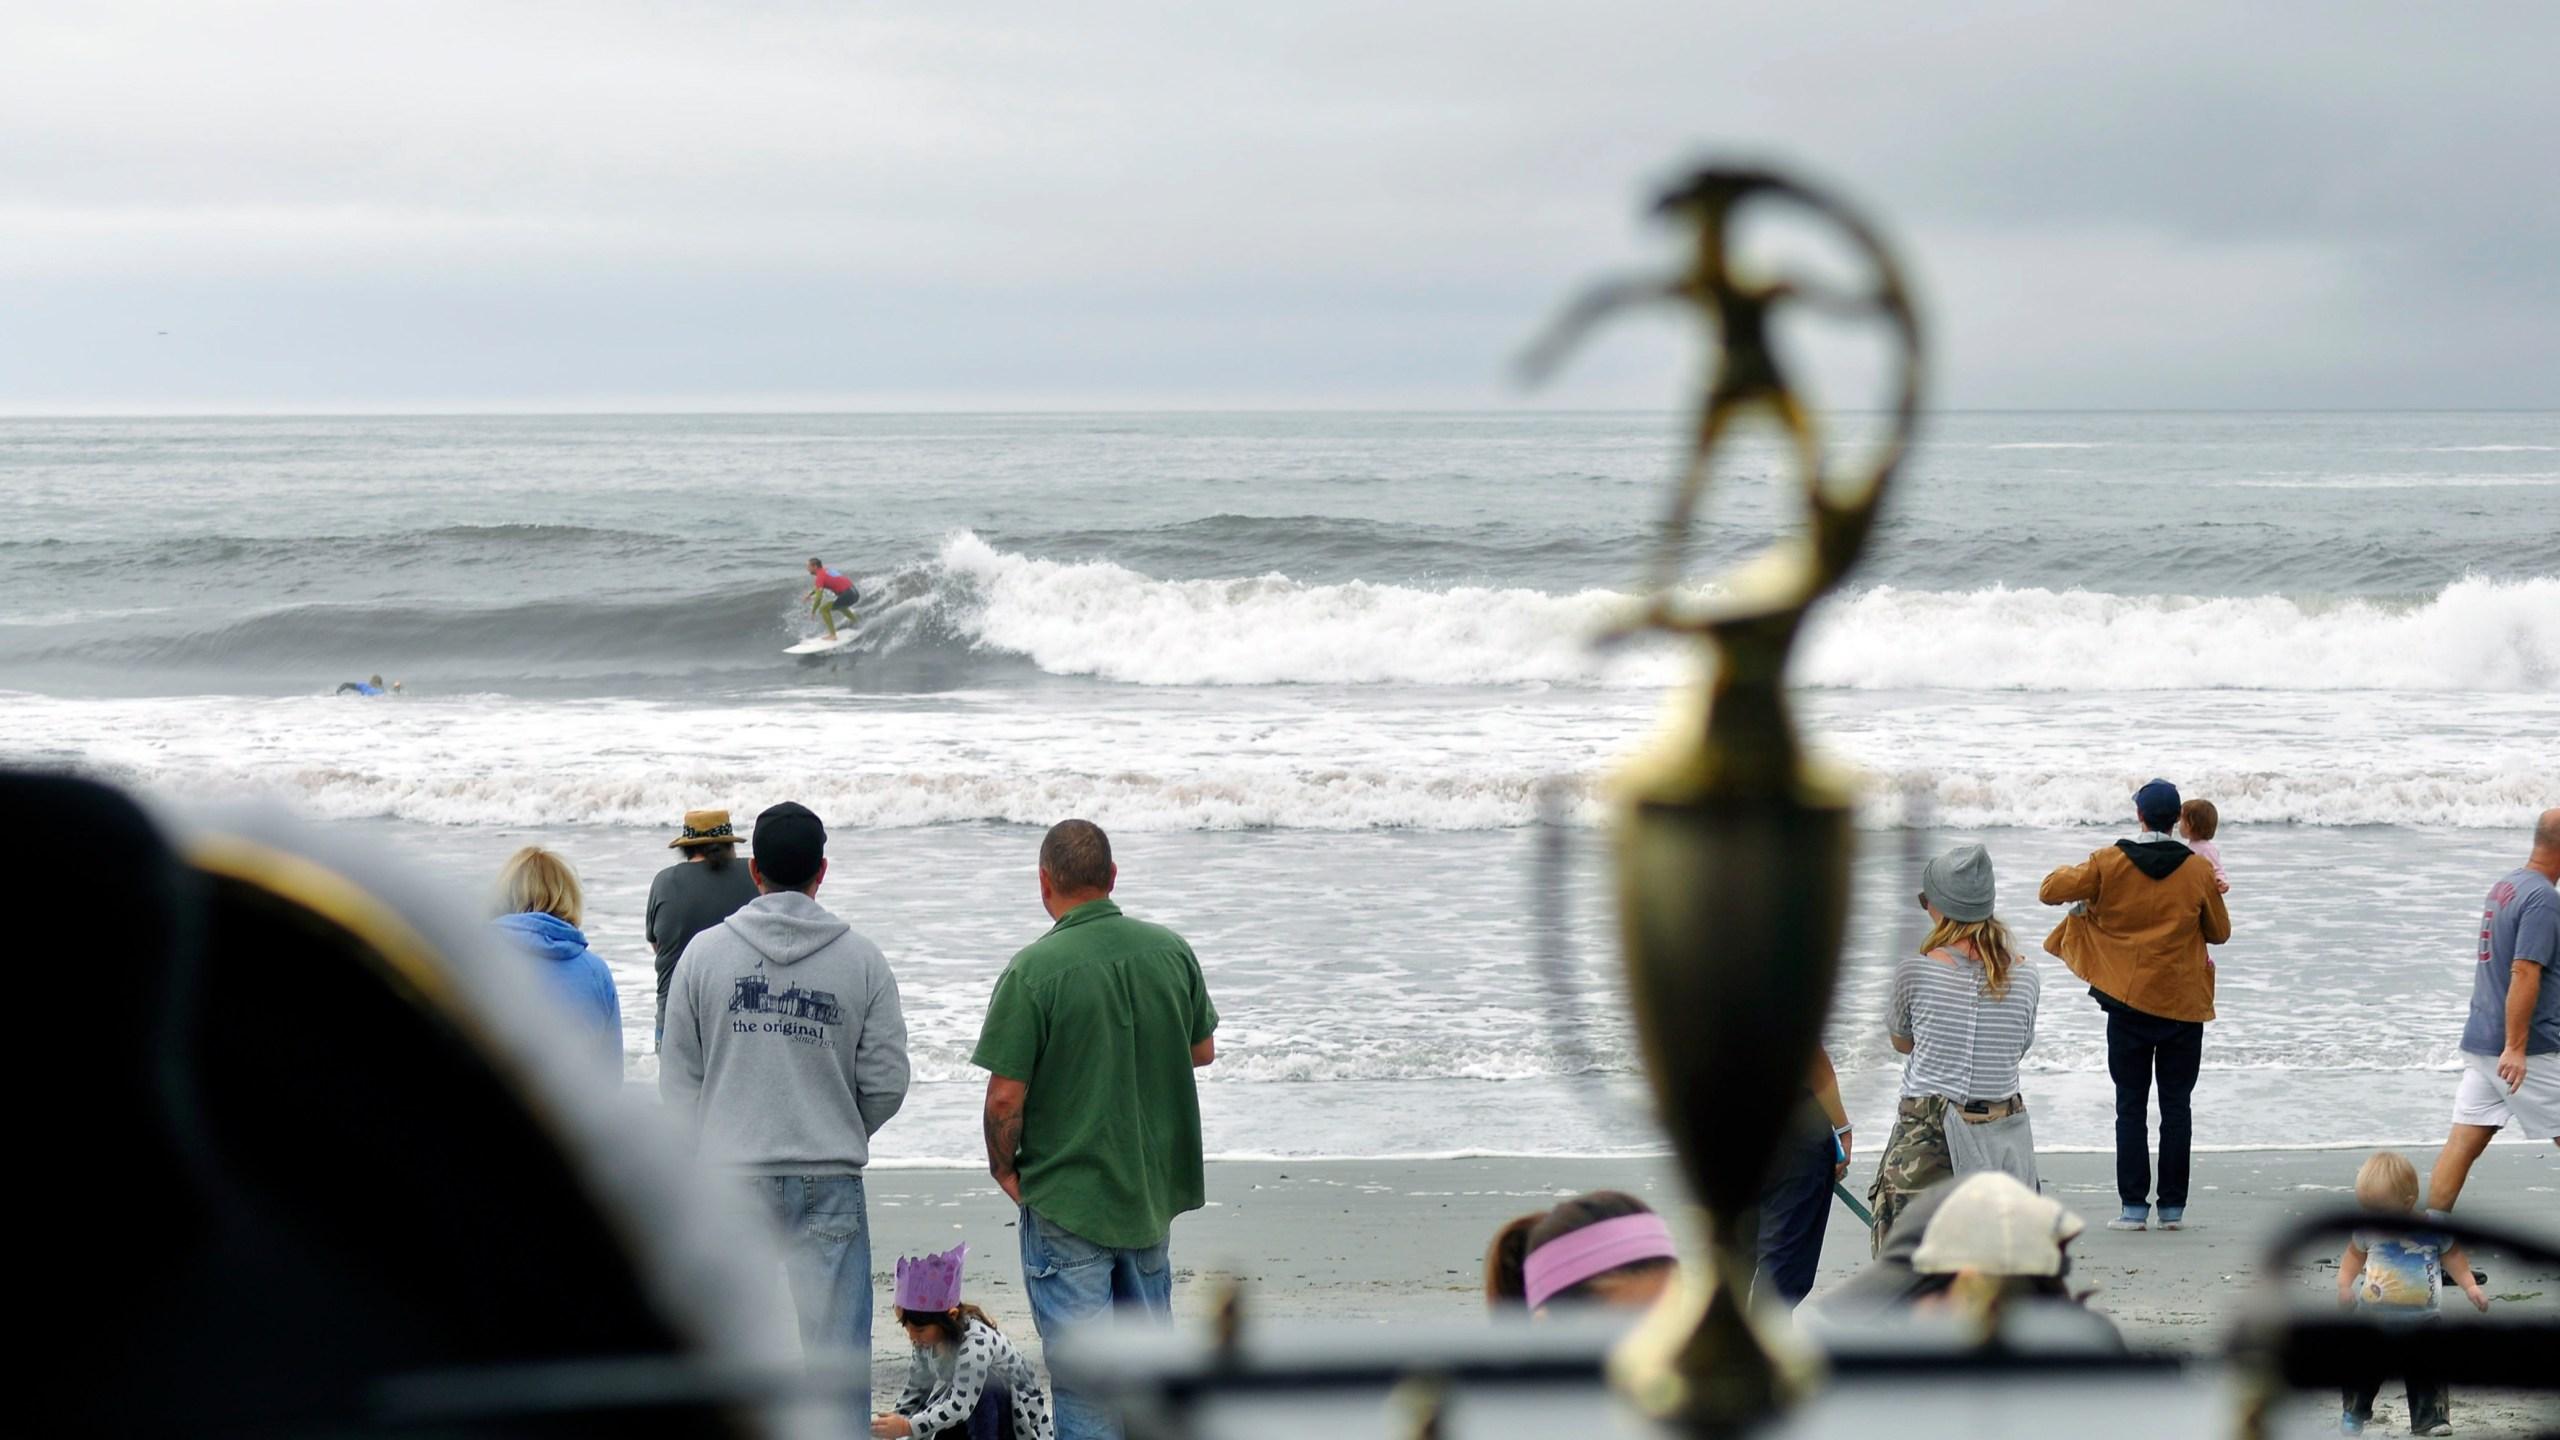 wbpro2016-trophy-surfer_374070